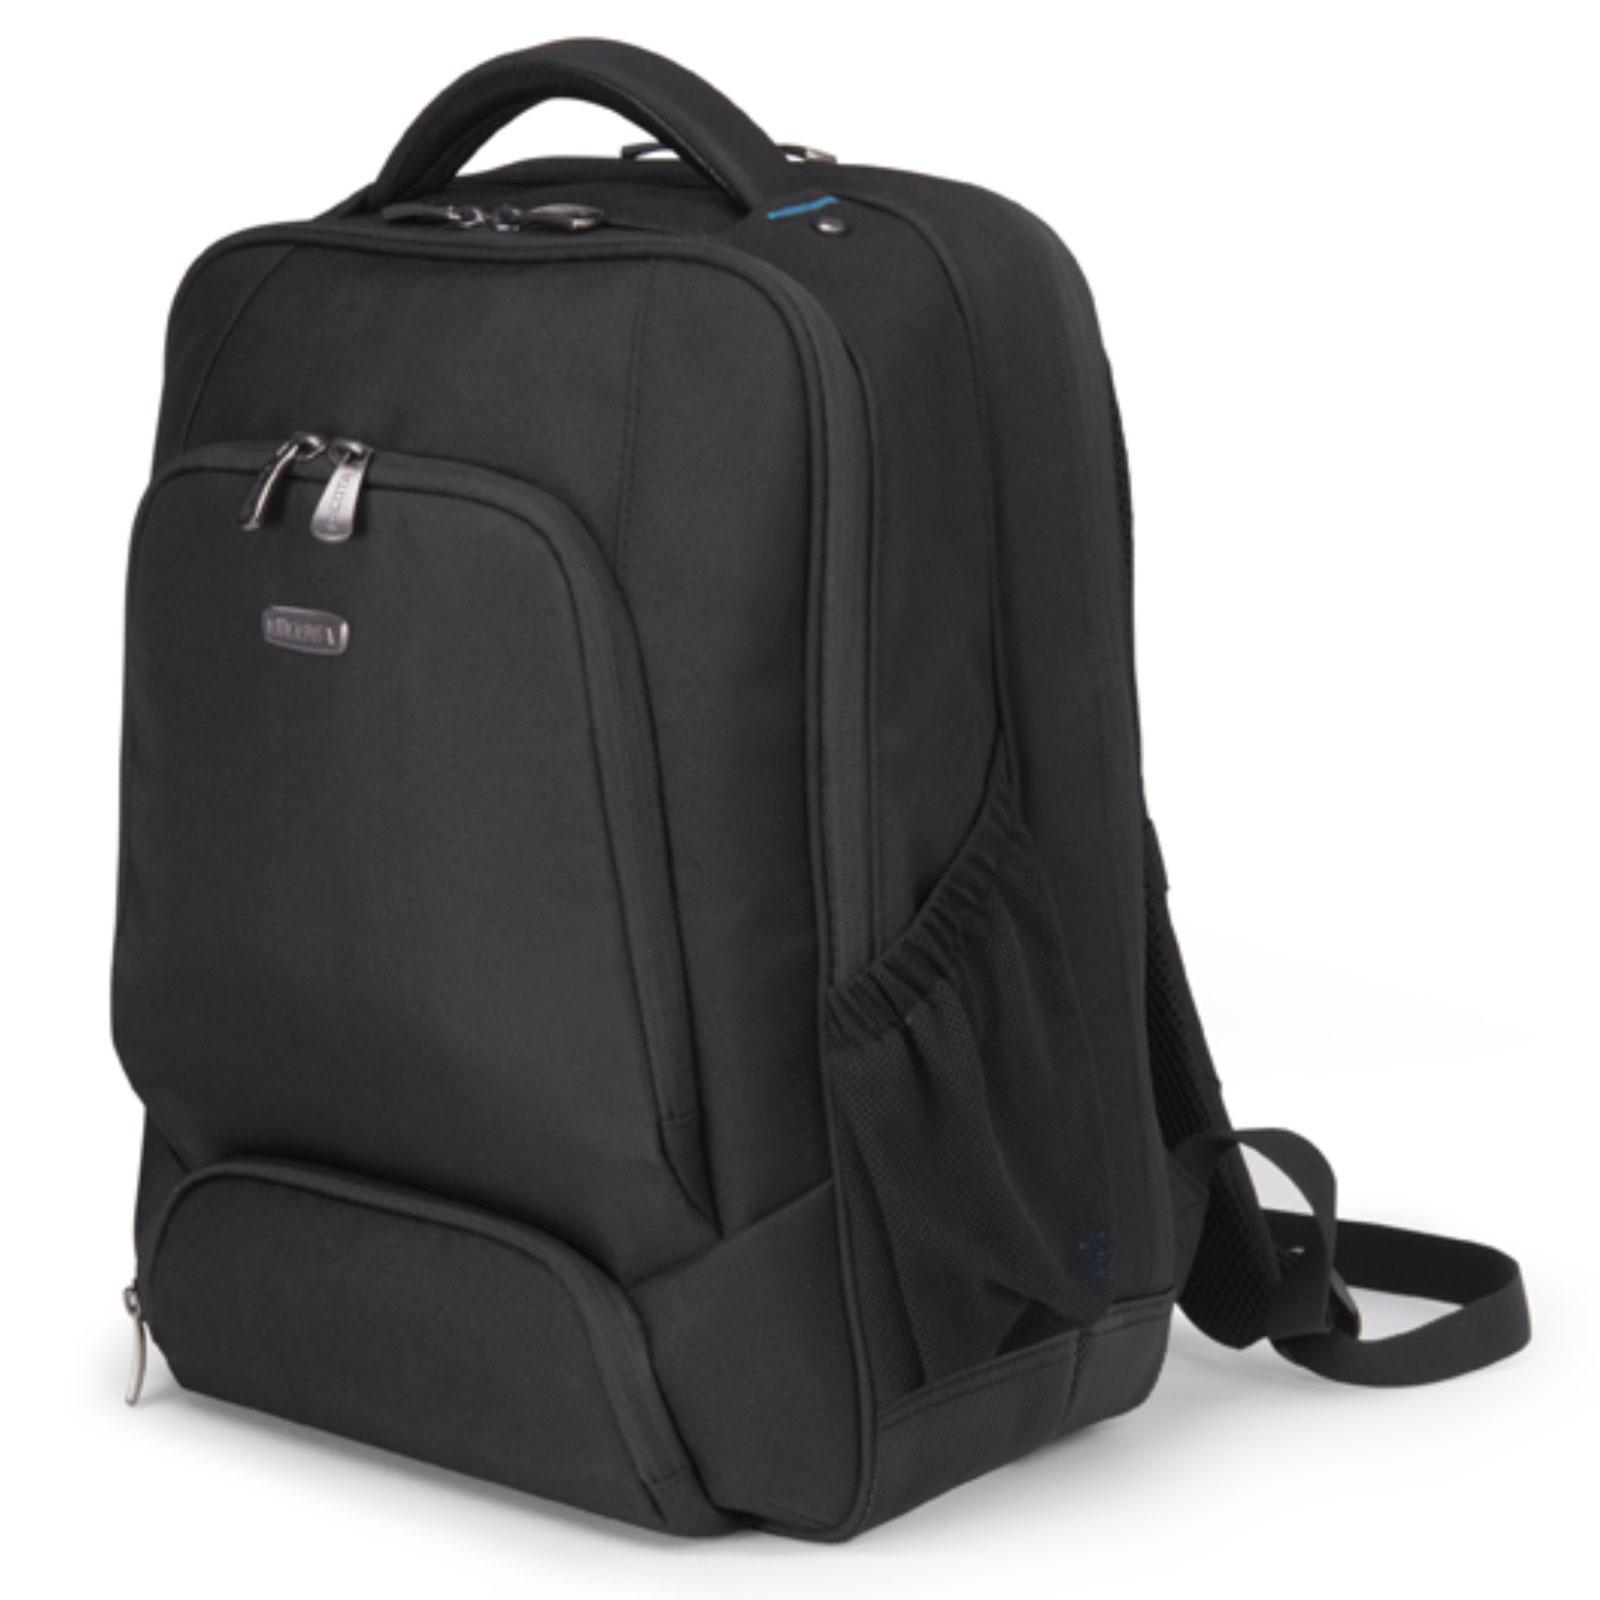 dicota multi backpack pro 13 15 6 sac sacoche housse dicota sur. Black Bedroom Furniture Sets. Home Design Ideas